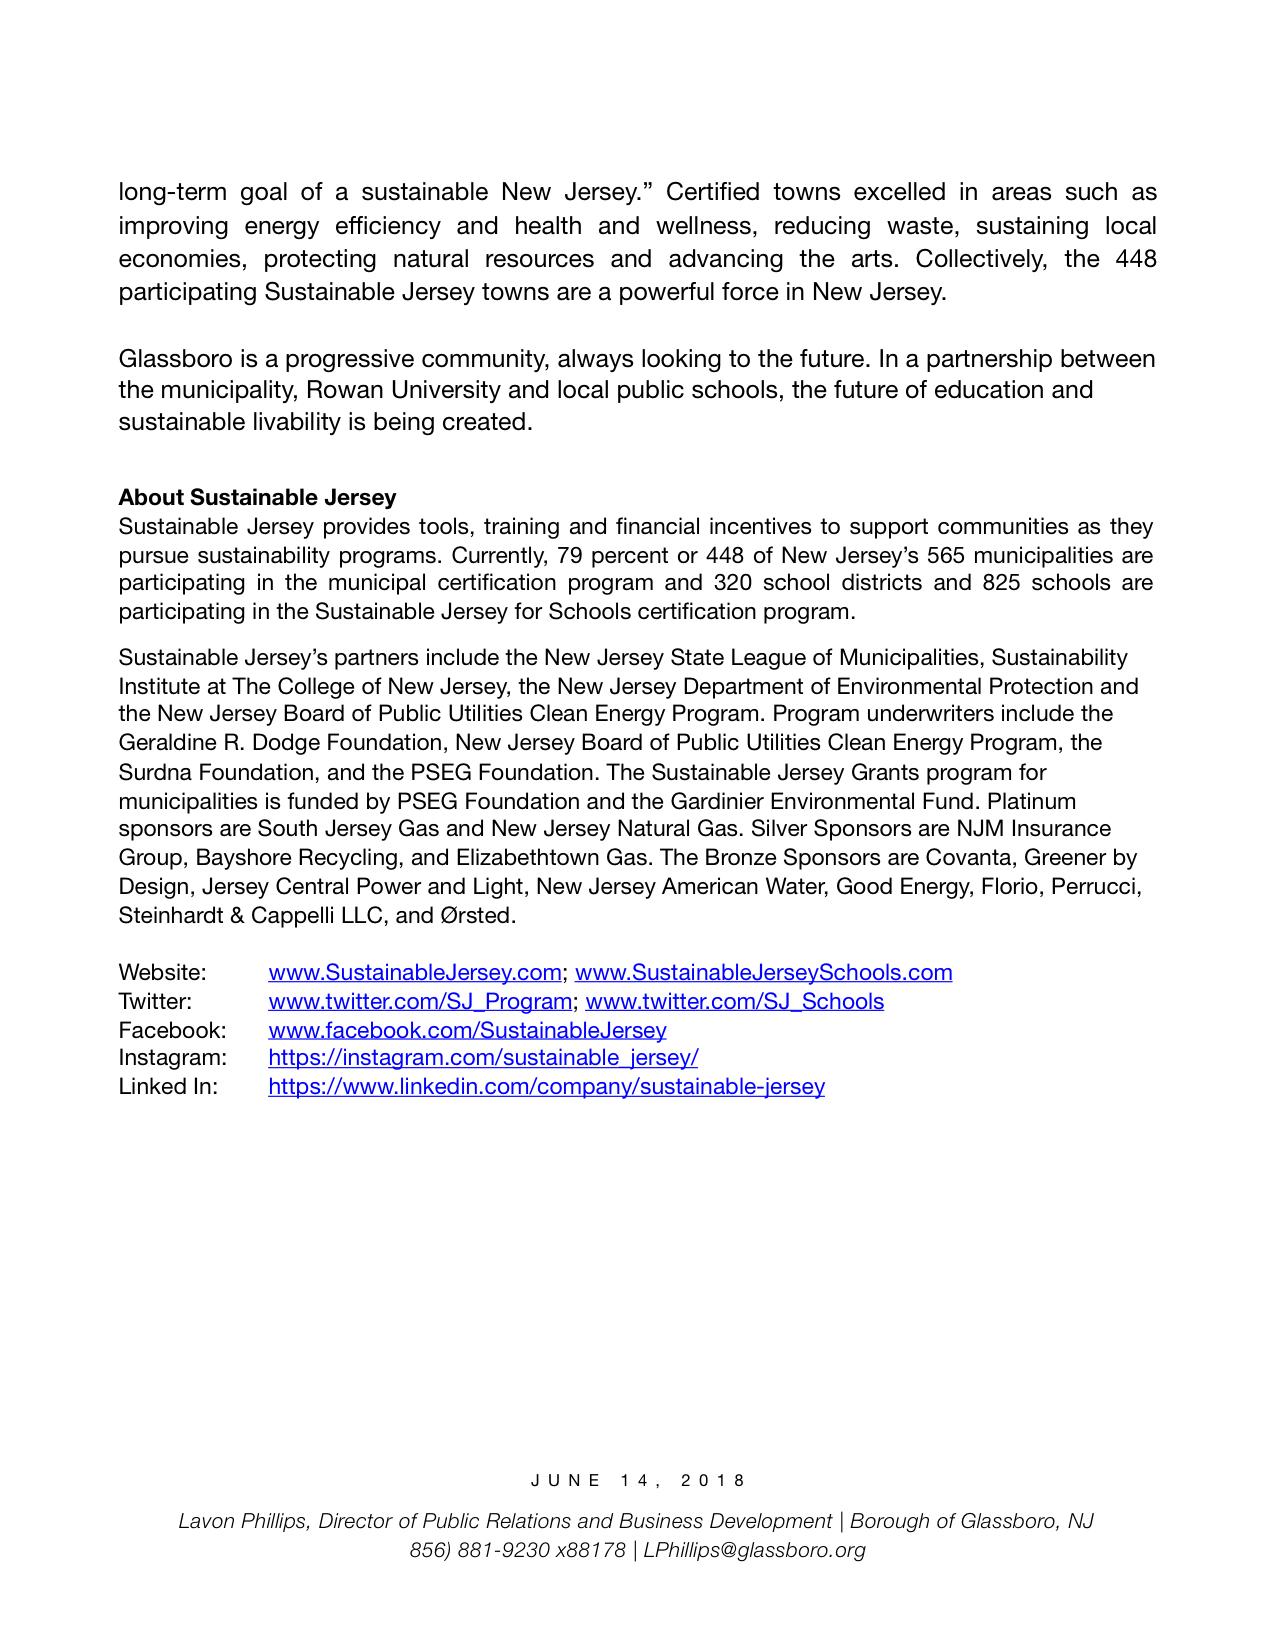 Glassboro NJ Press release Sustainable NJ Certification  copy 2.jpeg